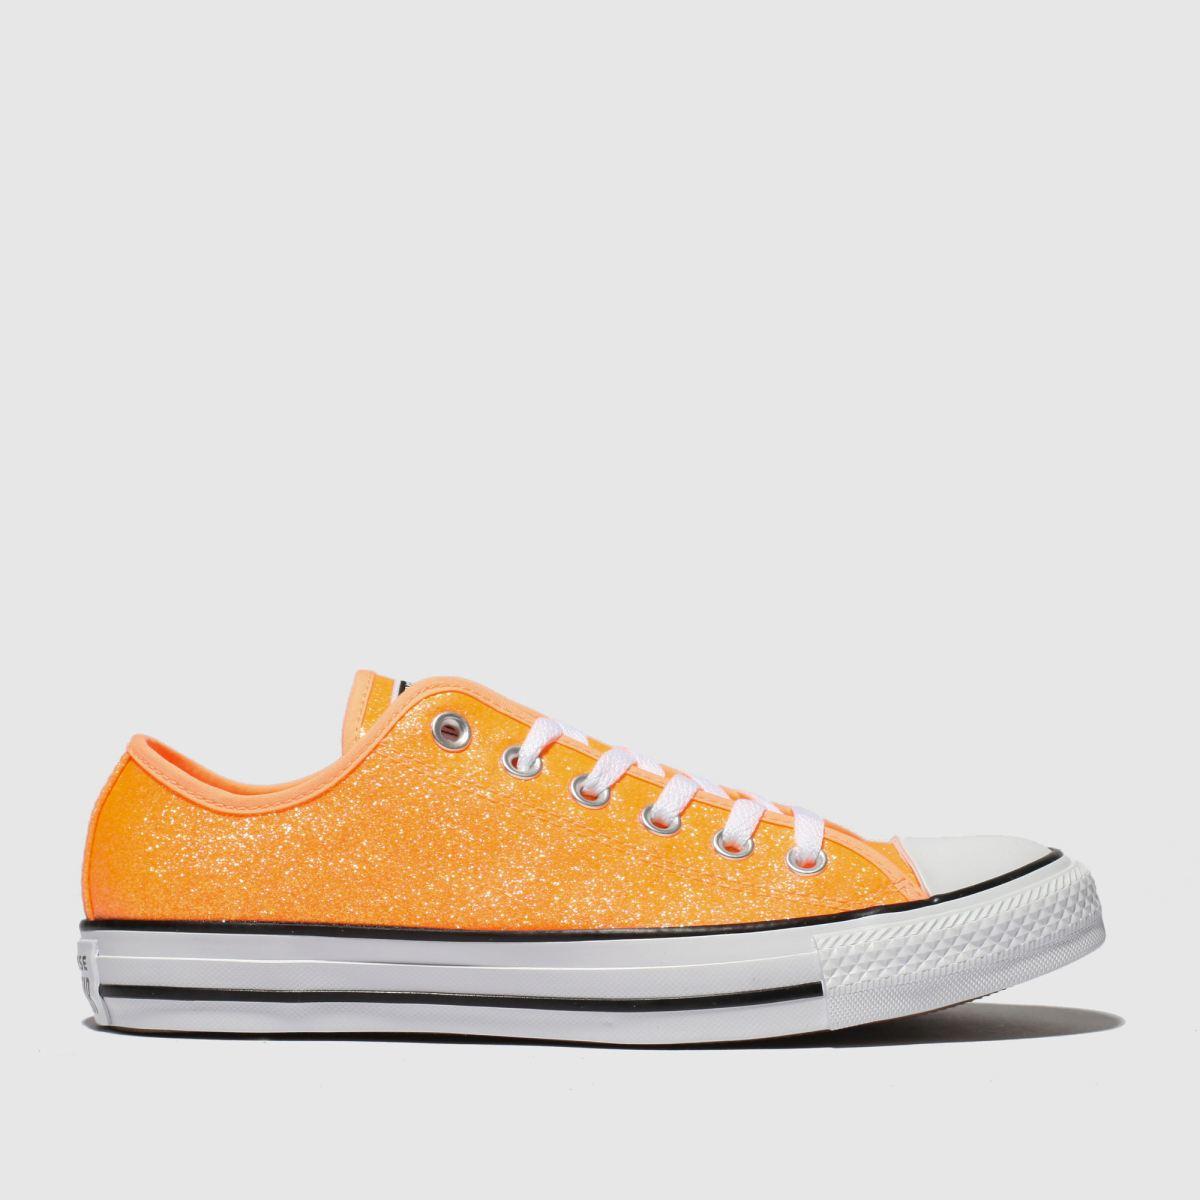 Converse Orange All Star Glitter Ox Trainers